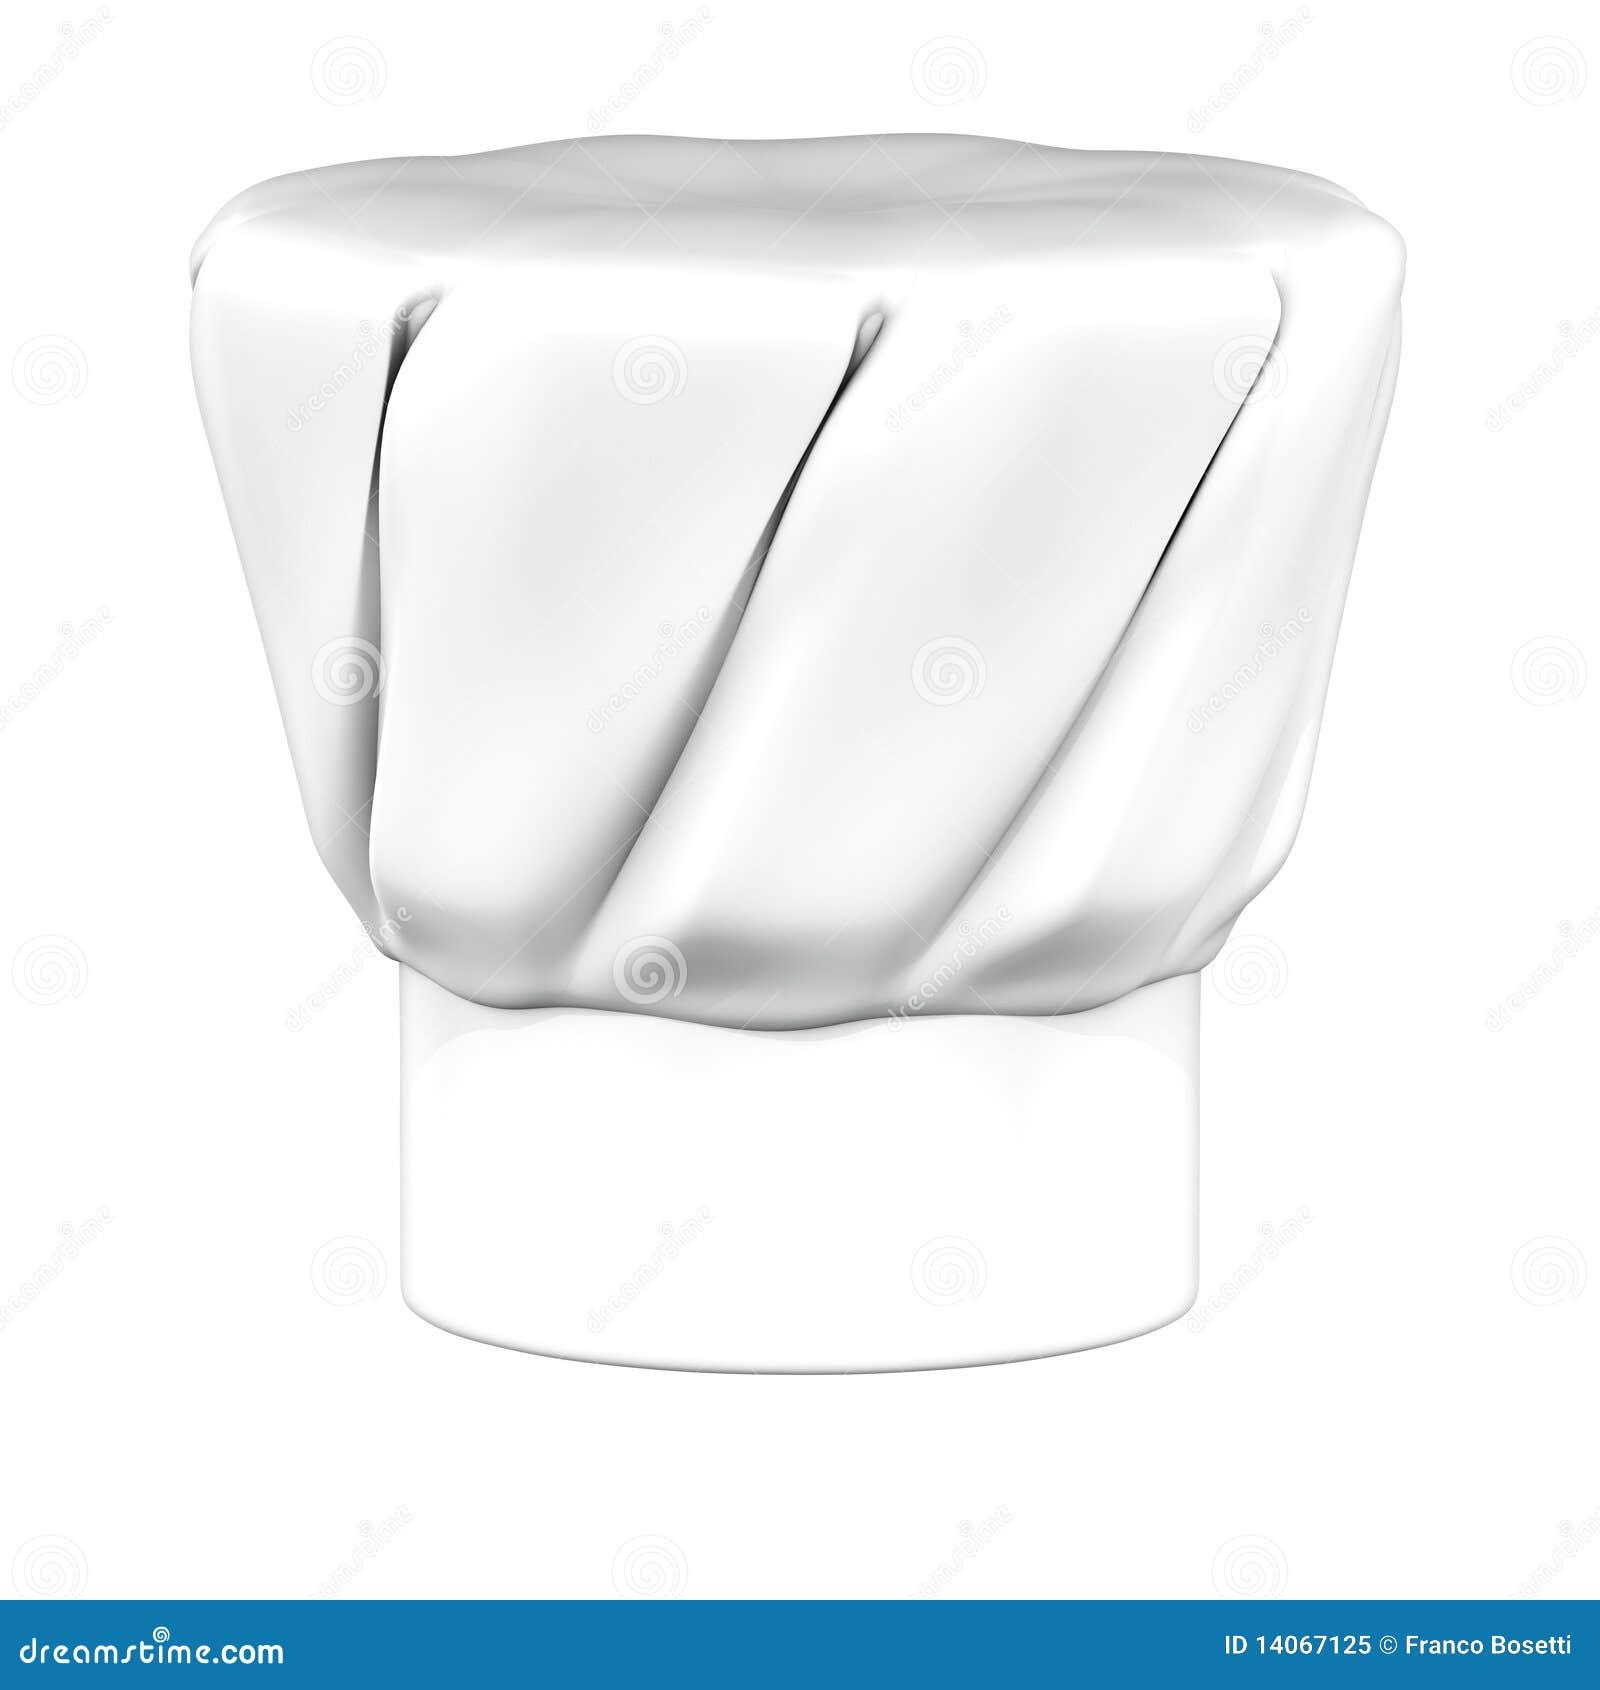 cuisinier de toque illustration stock illustration du chapeau 14067125. Black Bedroom Furniture Sets. Home Design Ideas